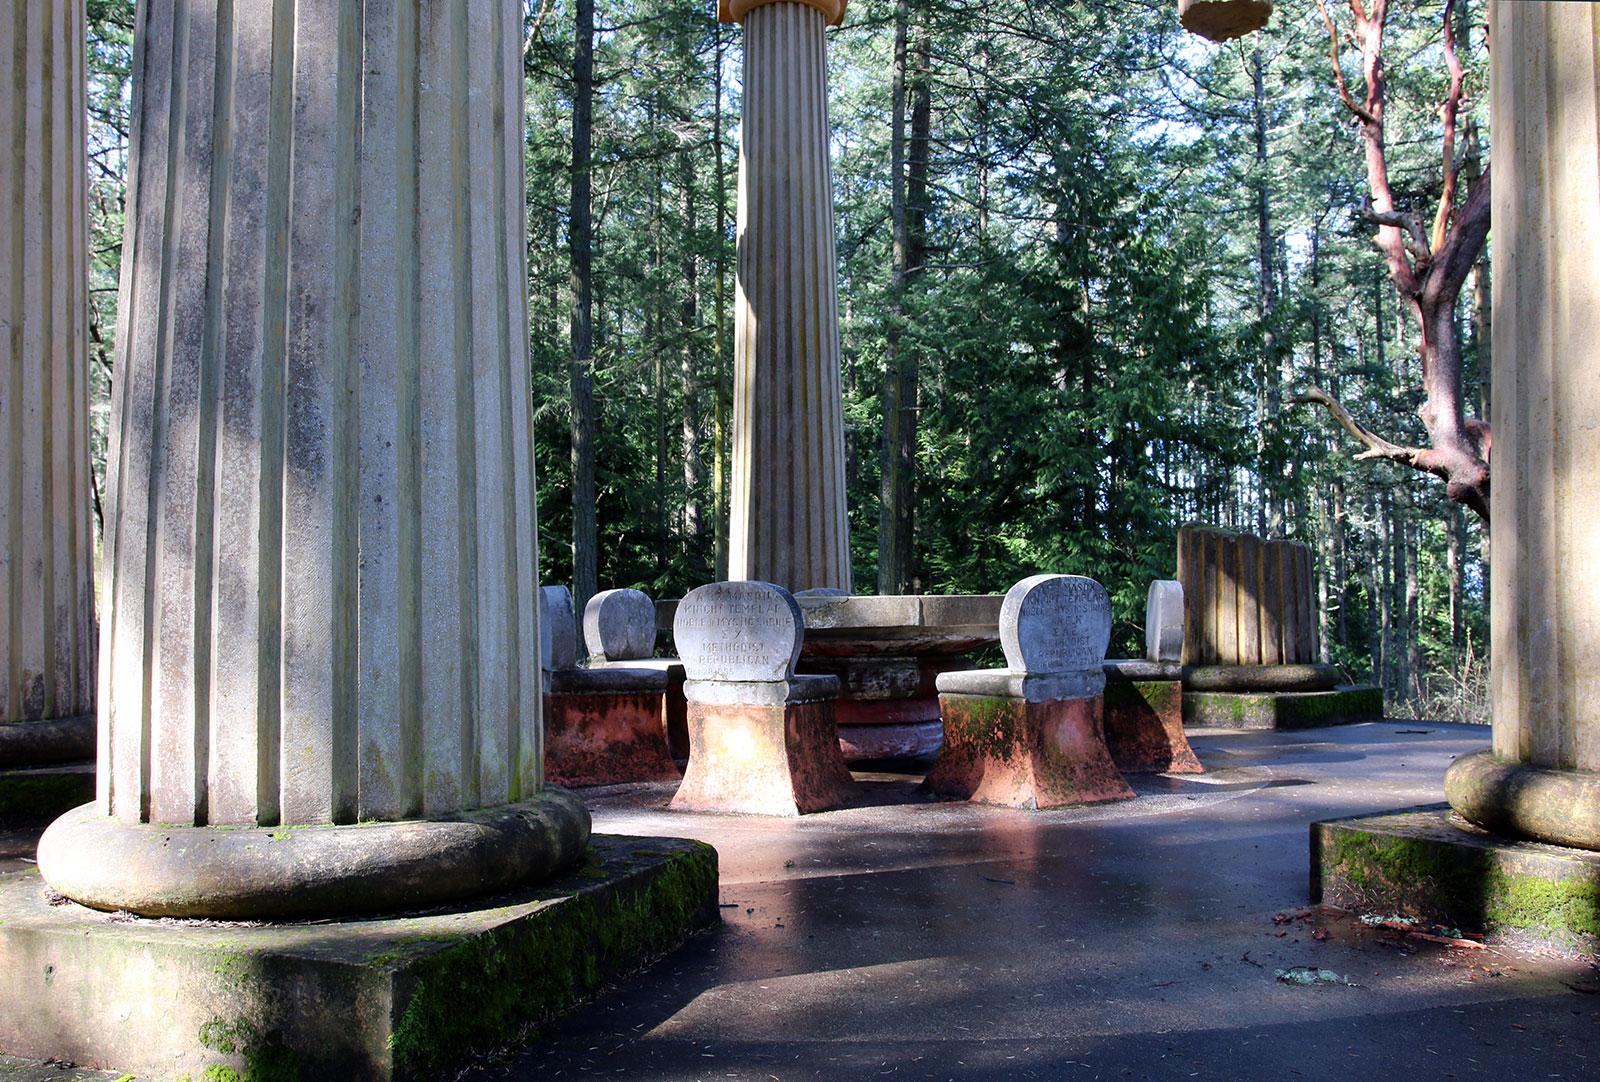 John S. McMillin Memorial Mausoleum